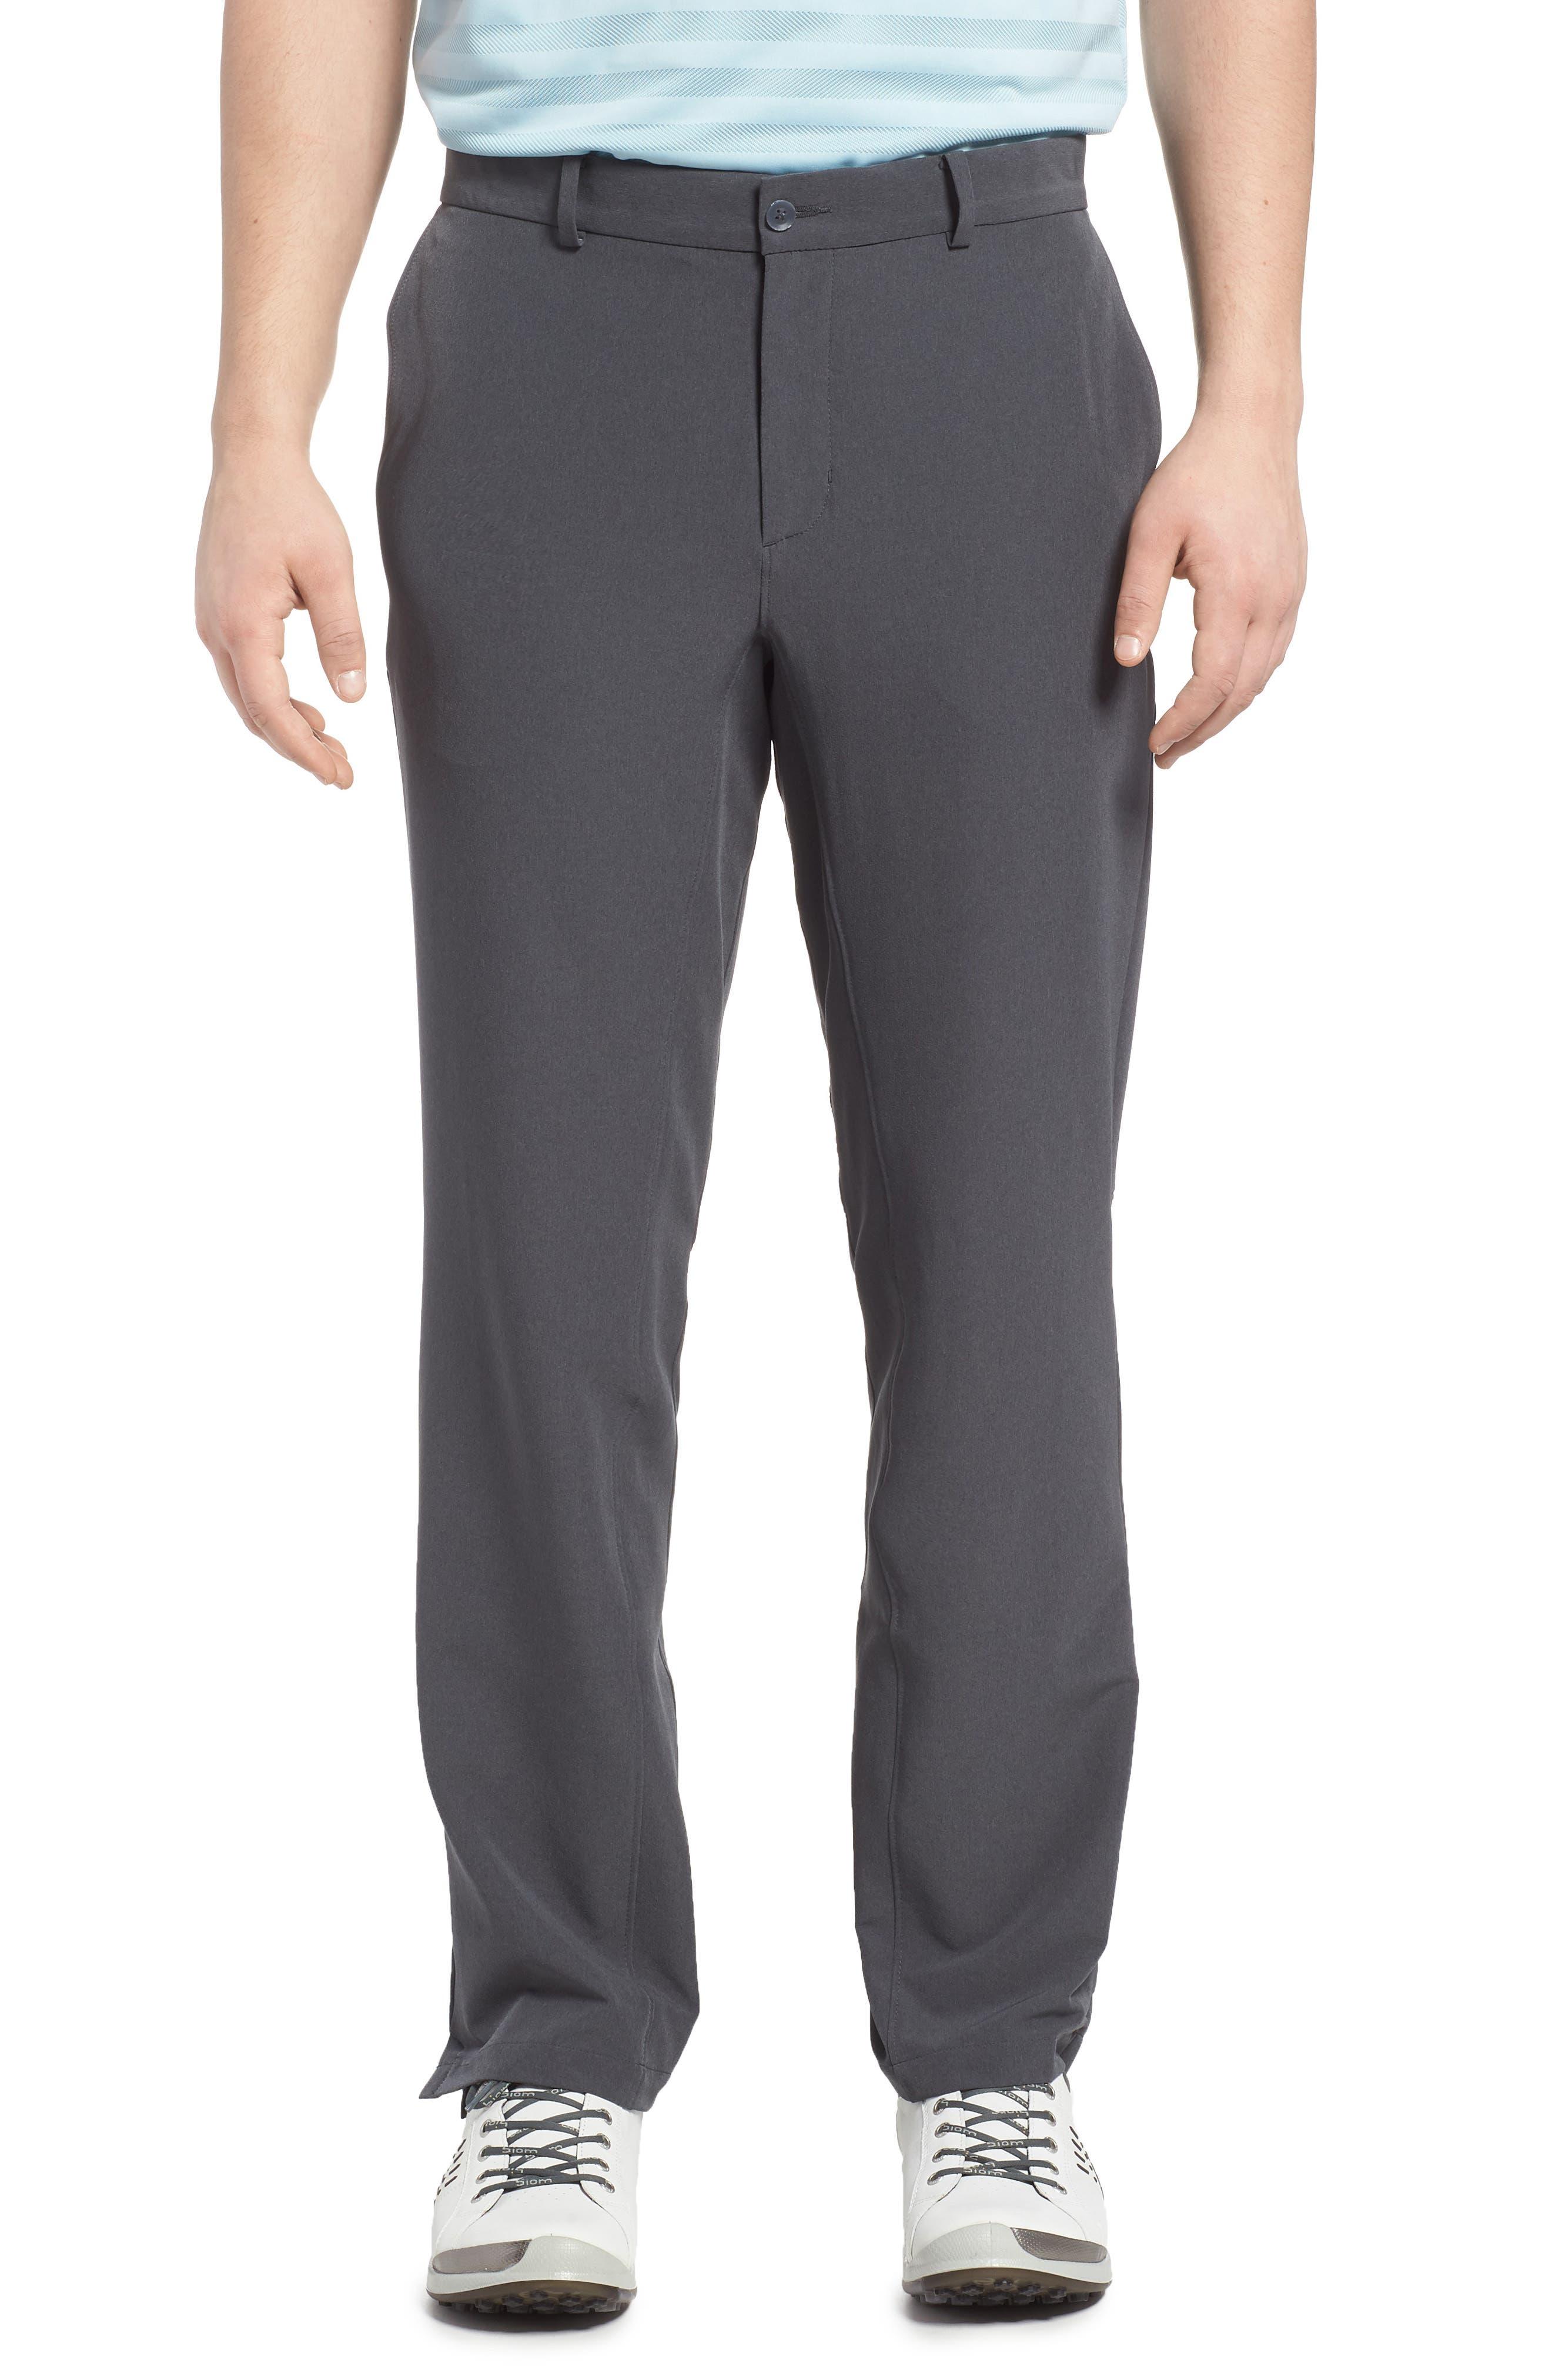 Hybrid Flex Golf Pants,                         Main,                         color, CHARCOAL HEATHER/ DARK GREY